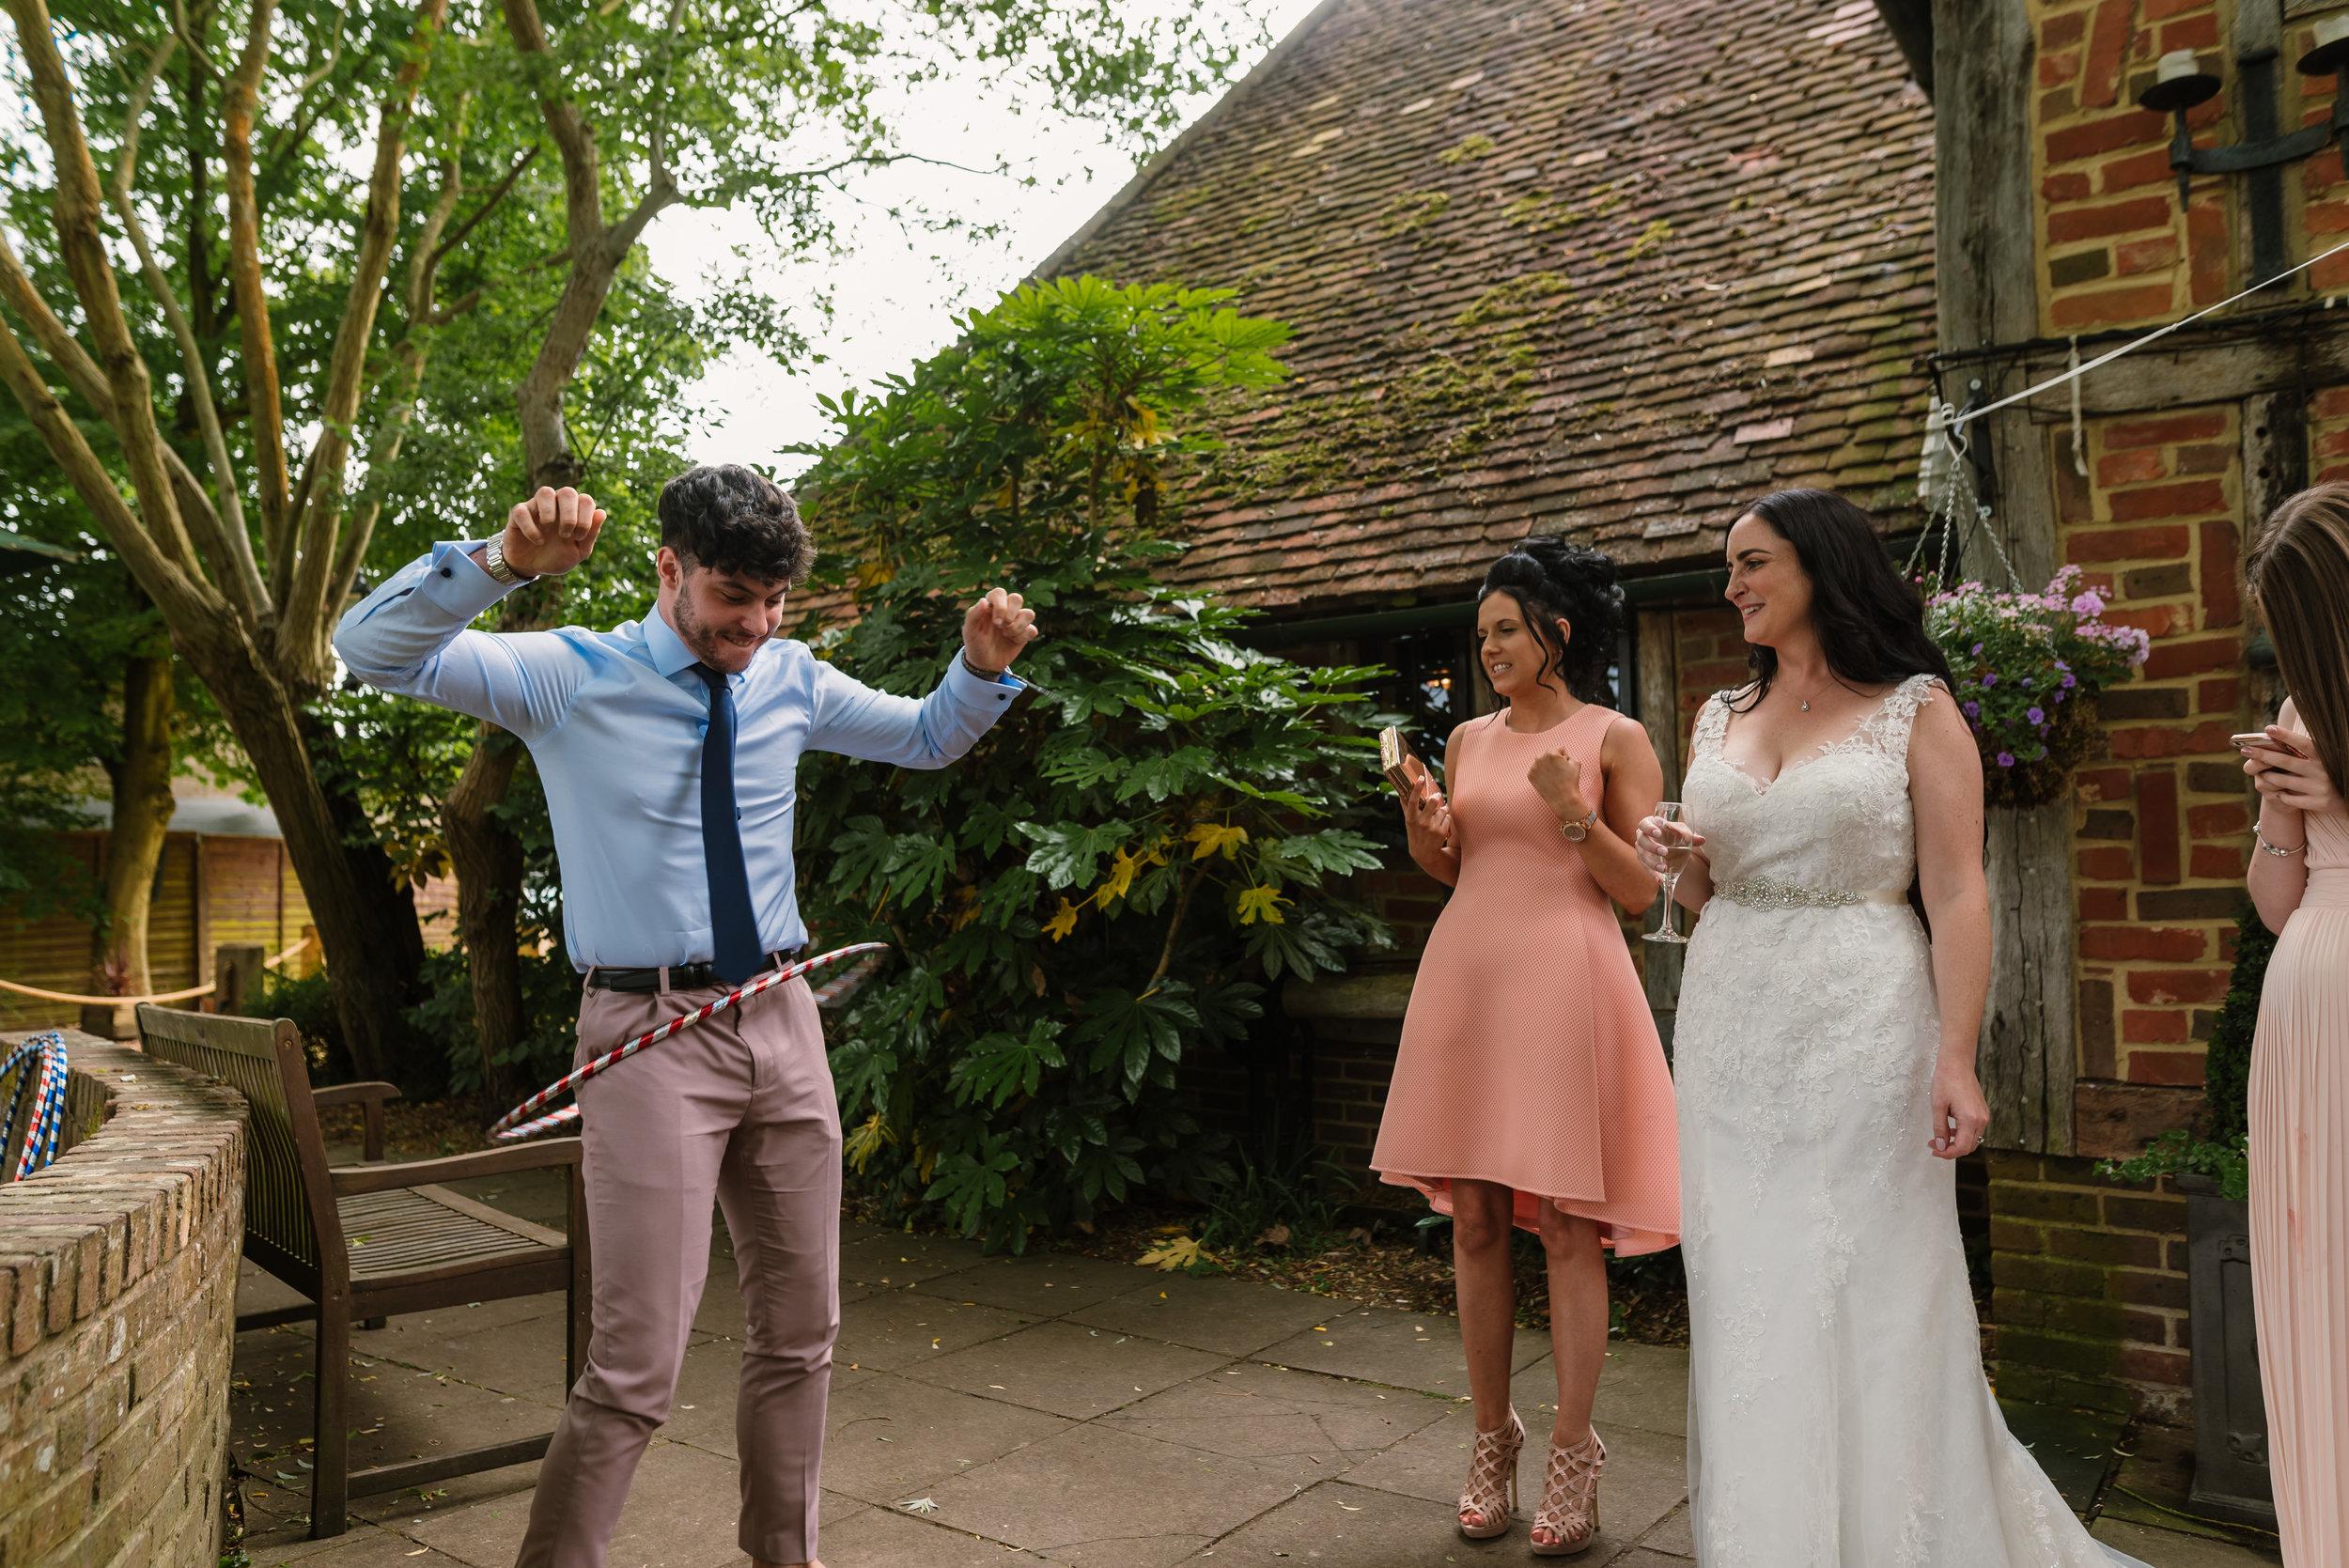 Sarah-Fishlock-Photography : Hampshire-wedding-photographer-hampshire : fleet-wedding-photographer-fleet : Meade-Hall-Wedding-Photographer : Meade-Hall-Wedding-Photos-972.jpg